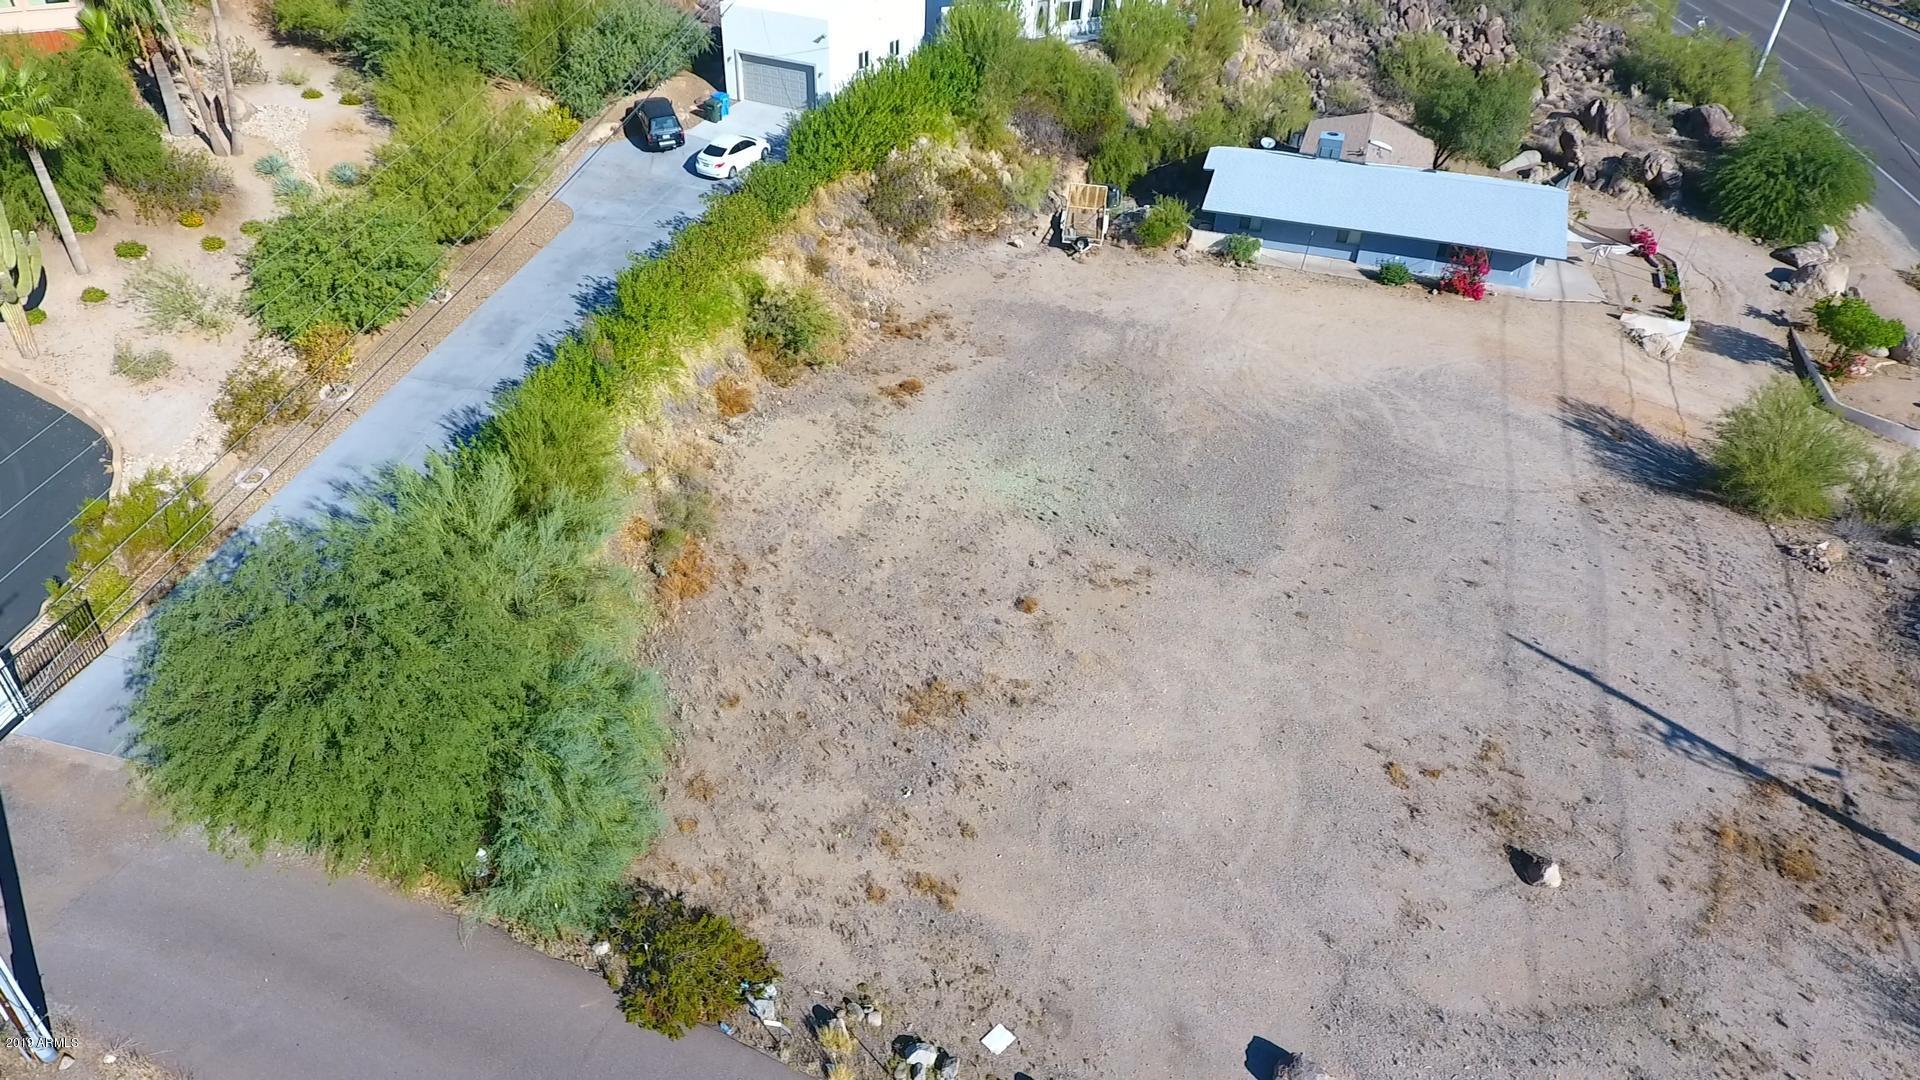 19634 N CAVE CREEK Road, Phoenix, AZ 85024, ,Land,For Sale,19634 N CAVE CREEK Road,5995473